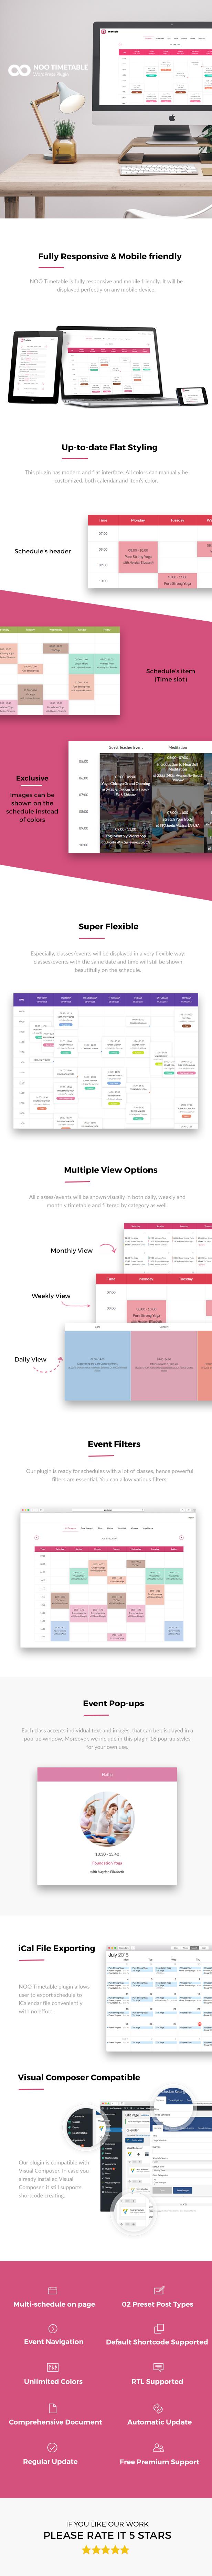 noo4 - Noo Timetable - Responsive Calendar & Auto Sync WordPress Plugin